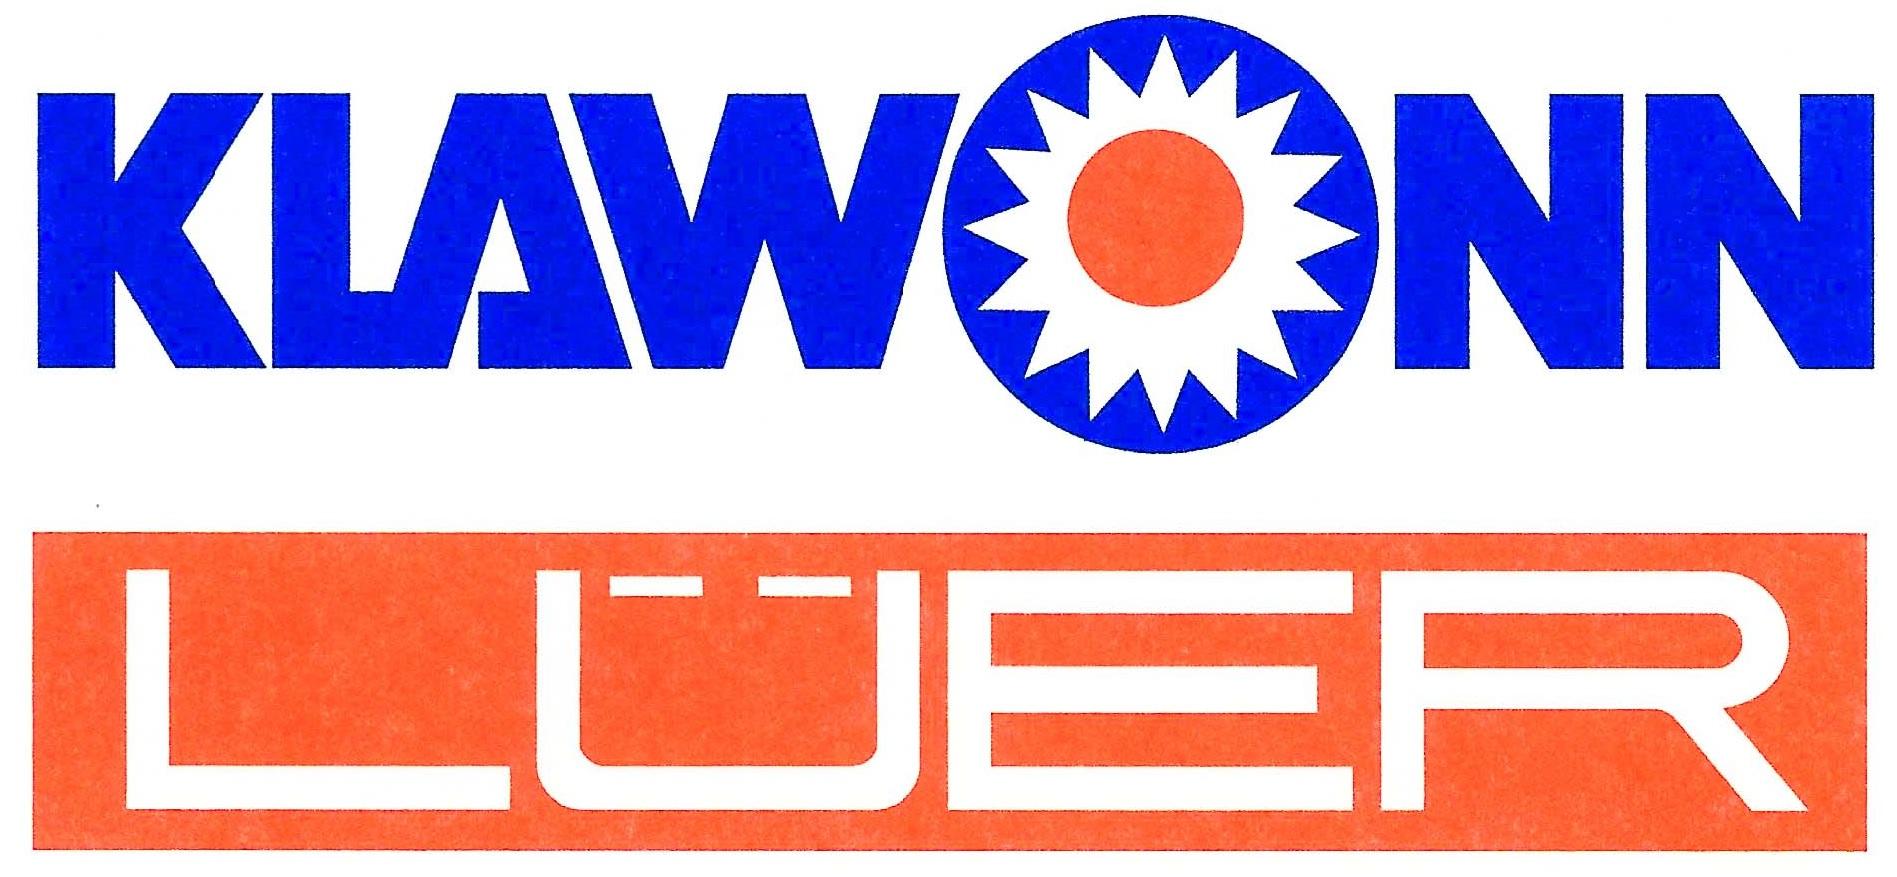 Logo von Manfred Klawonn & August Lüer, Haustechnik, Gesellschaft mit beschränkter Haftung